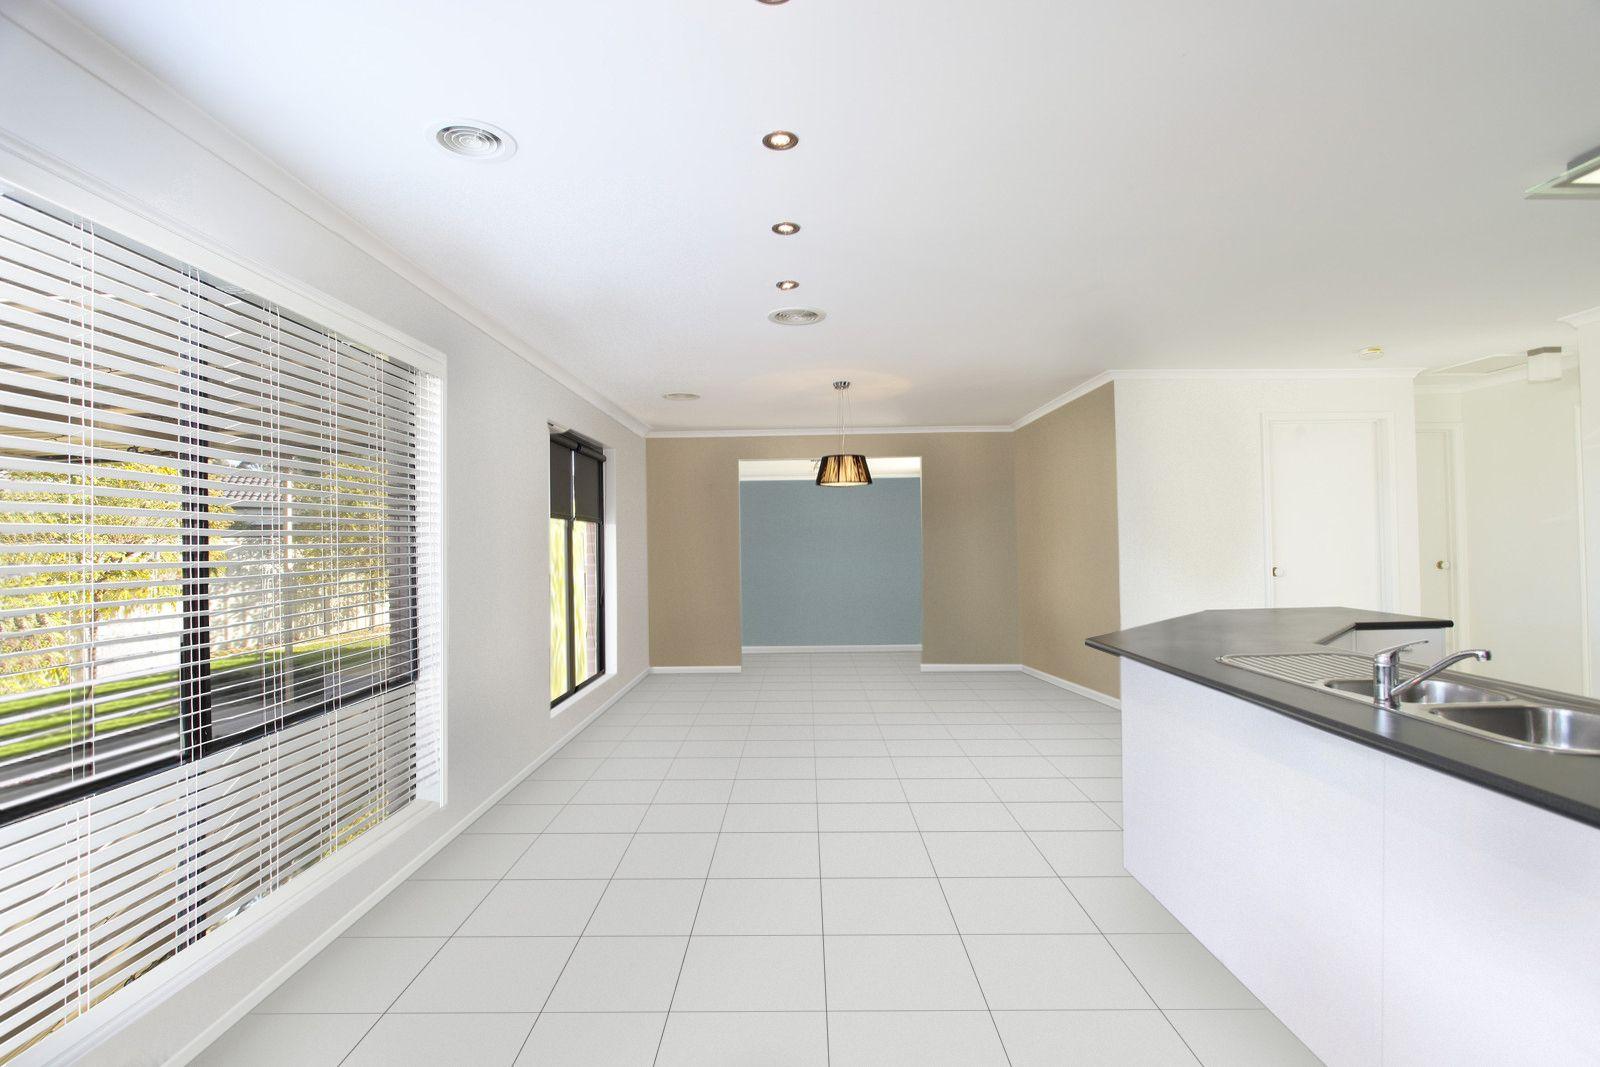 36 Saxby Drive, Strathfieldsaye VIC 3551, Image 2